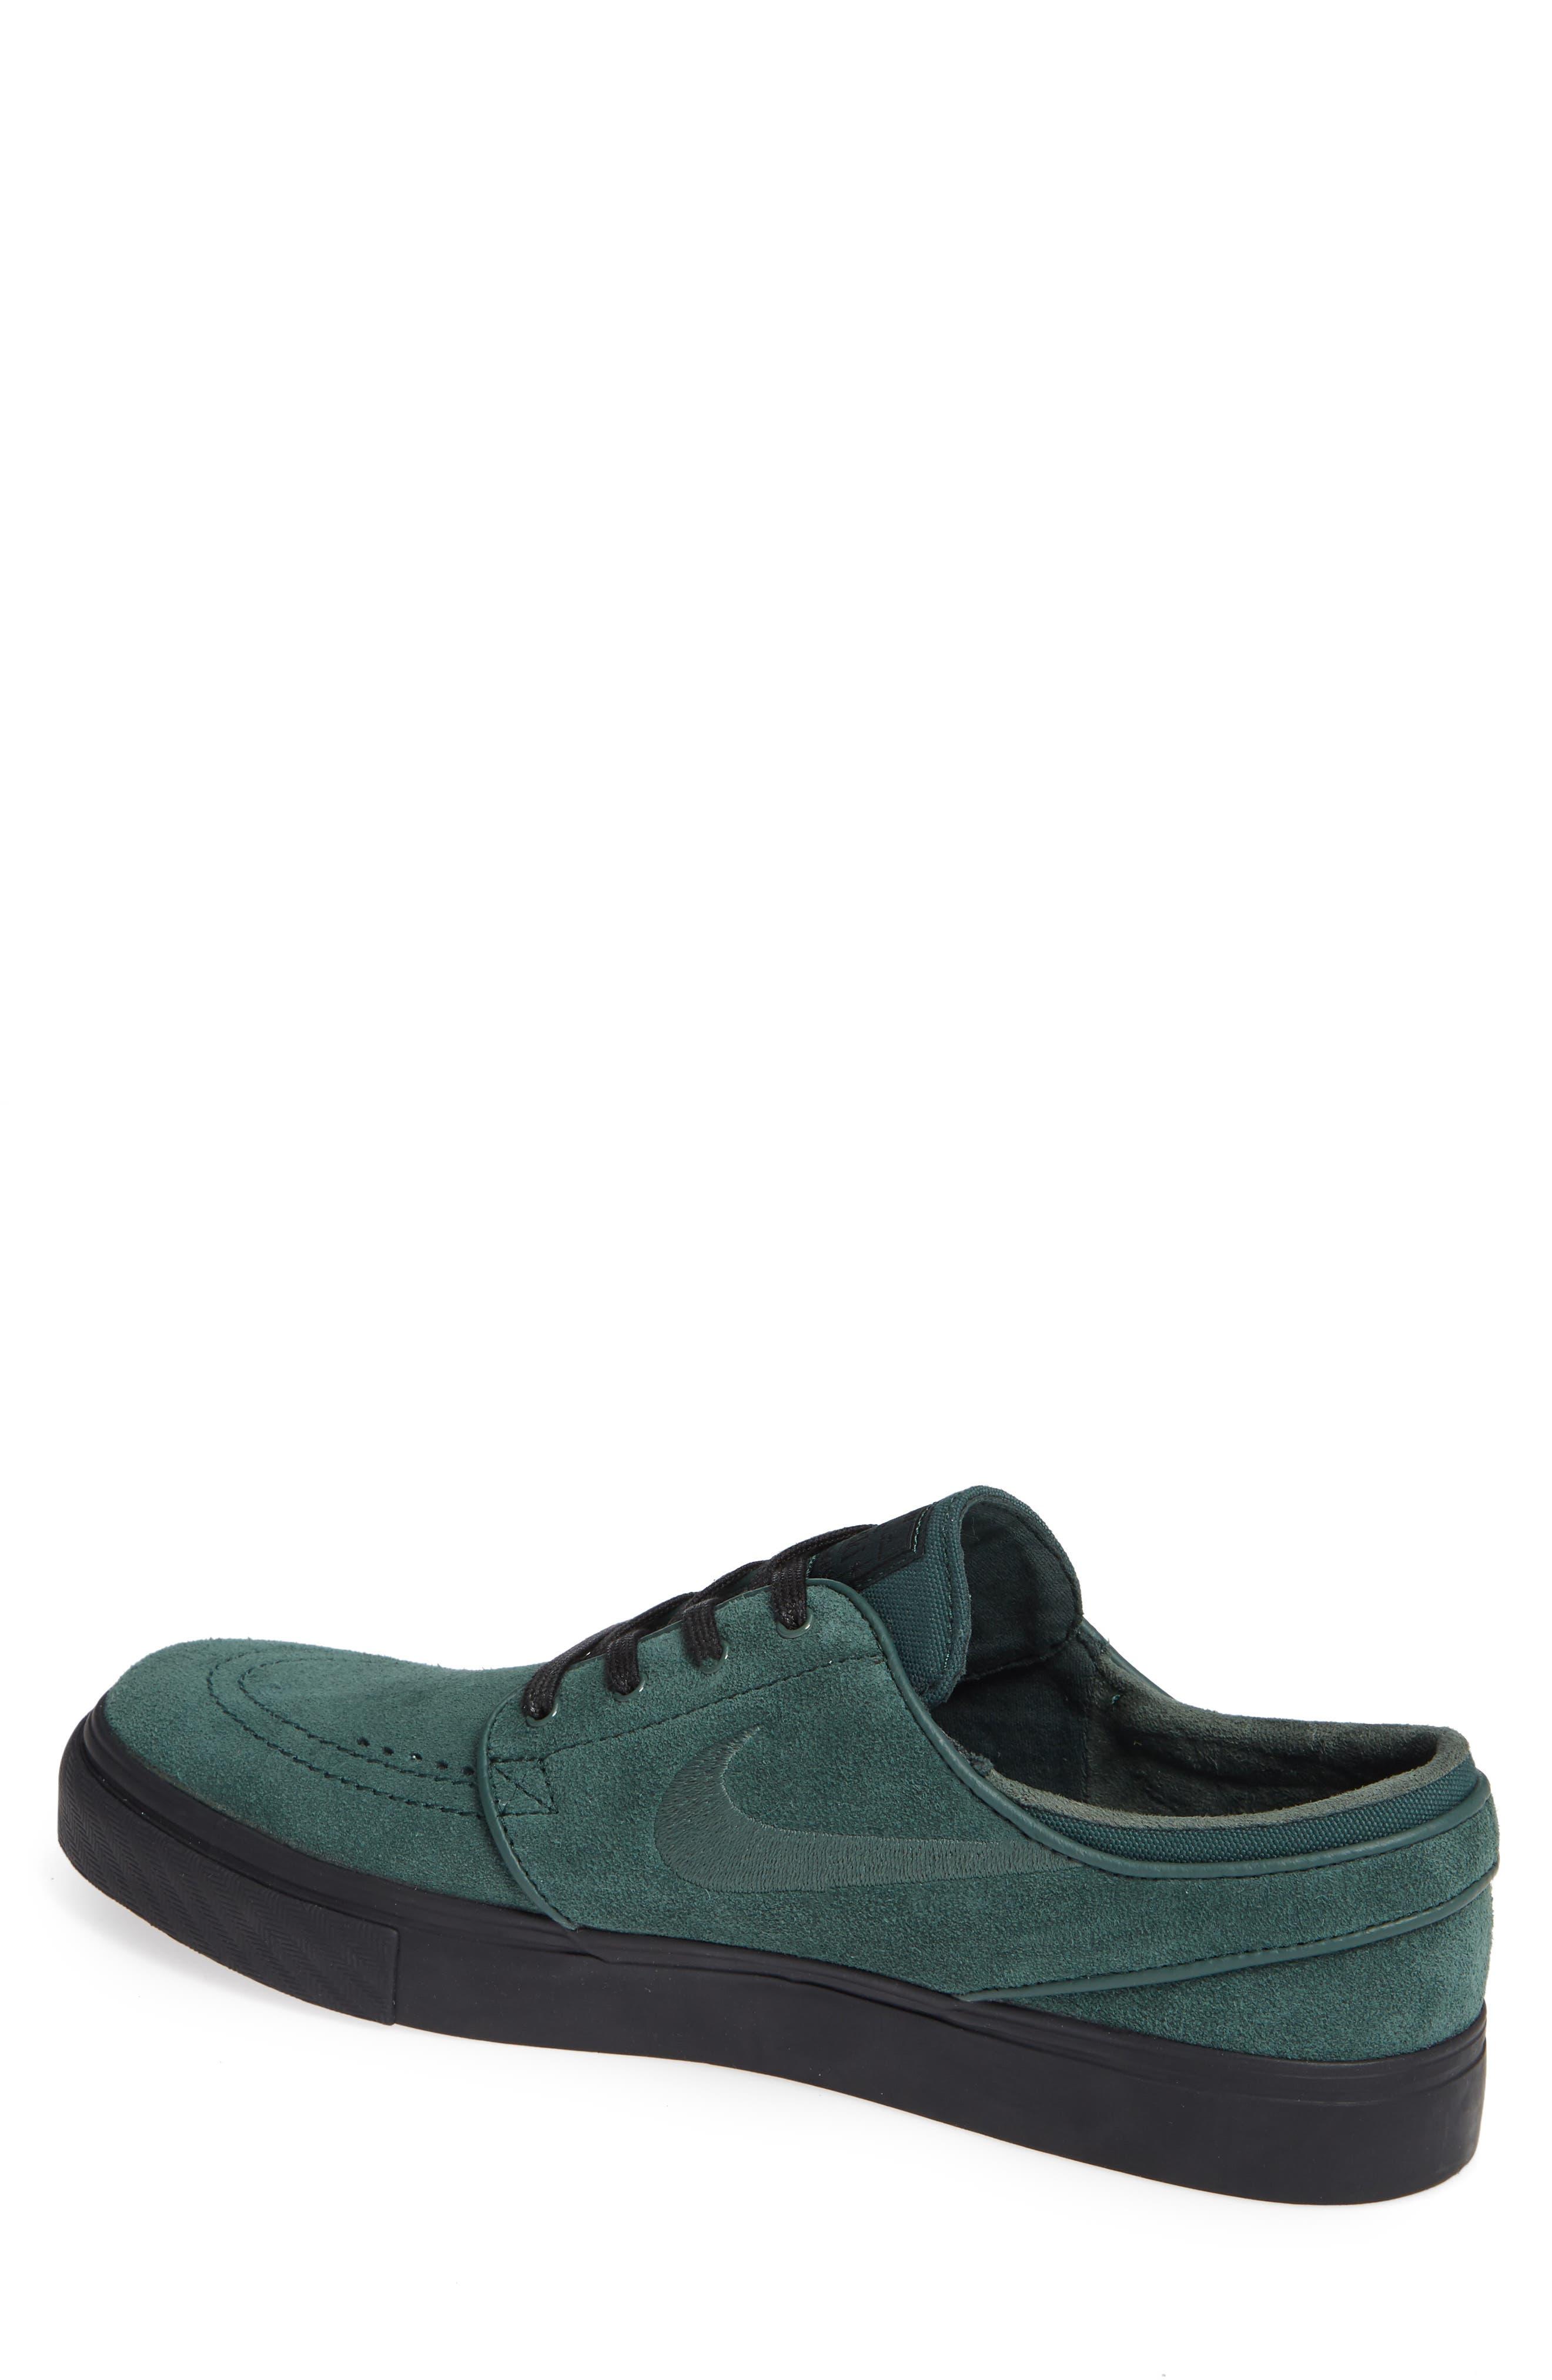 'Zoom - Stefan Janoski' Skate Shoe,                             Alternate thumbnail 2, color,                             Midnight Green/ Black